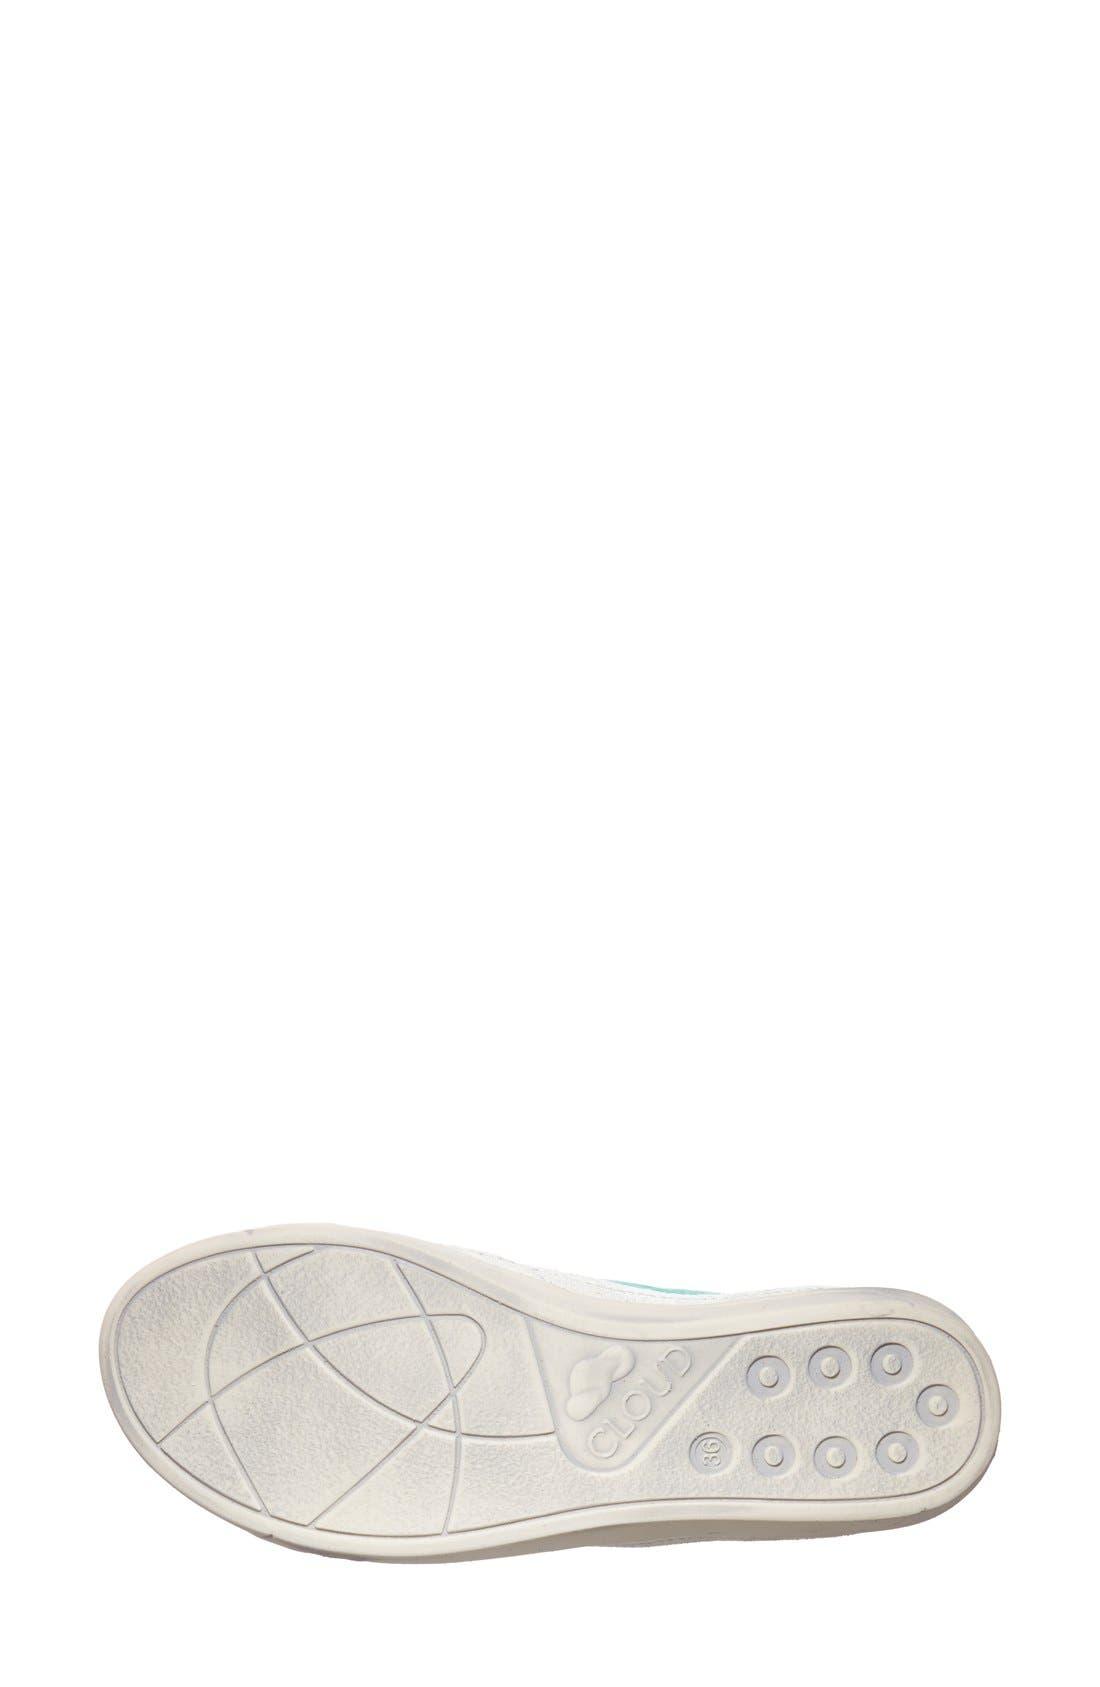 'Amazonas' Leather Sneaker,                             Alternate thumbnail 4, color,                             GREEN